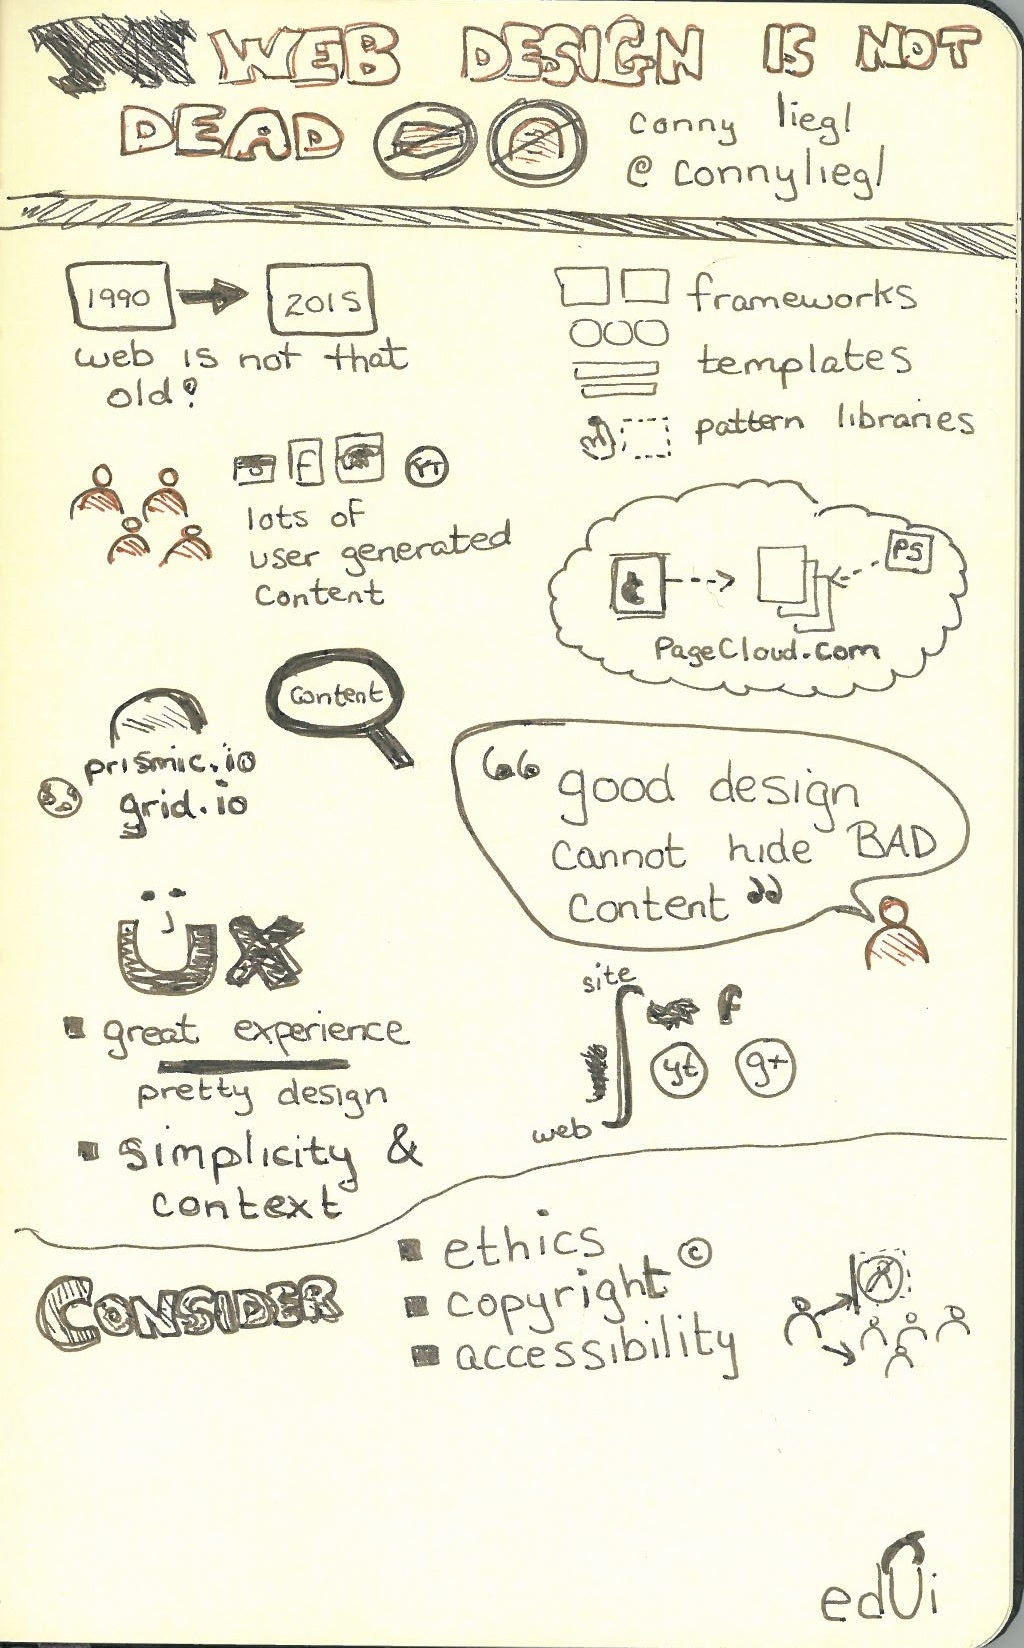 Web Design is Not Dead (EdUiConf 2015).jpg